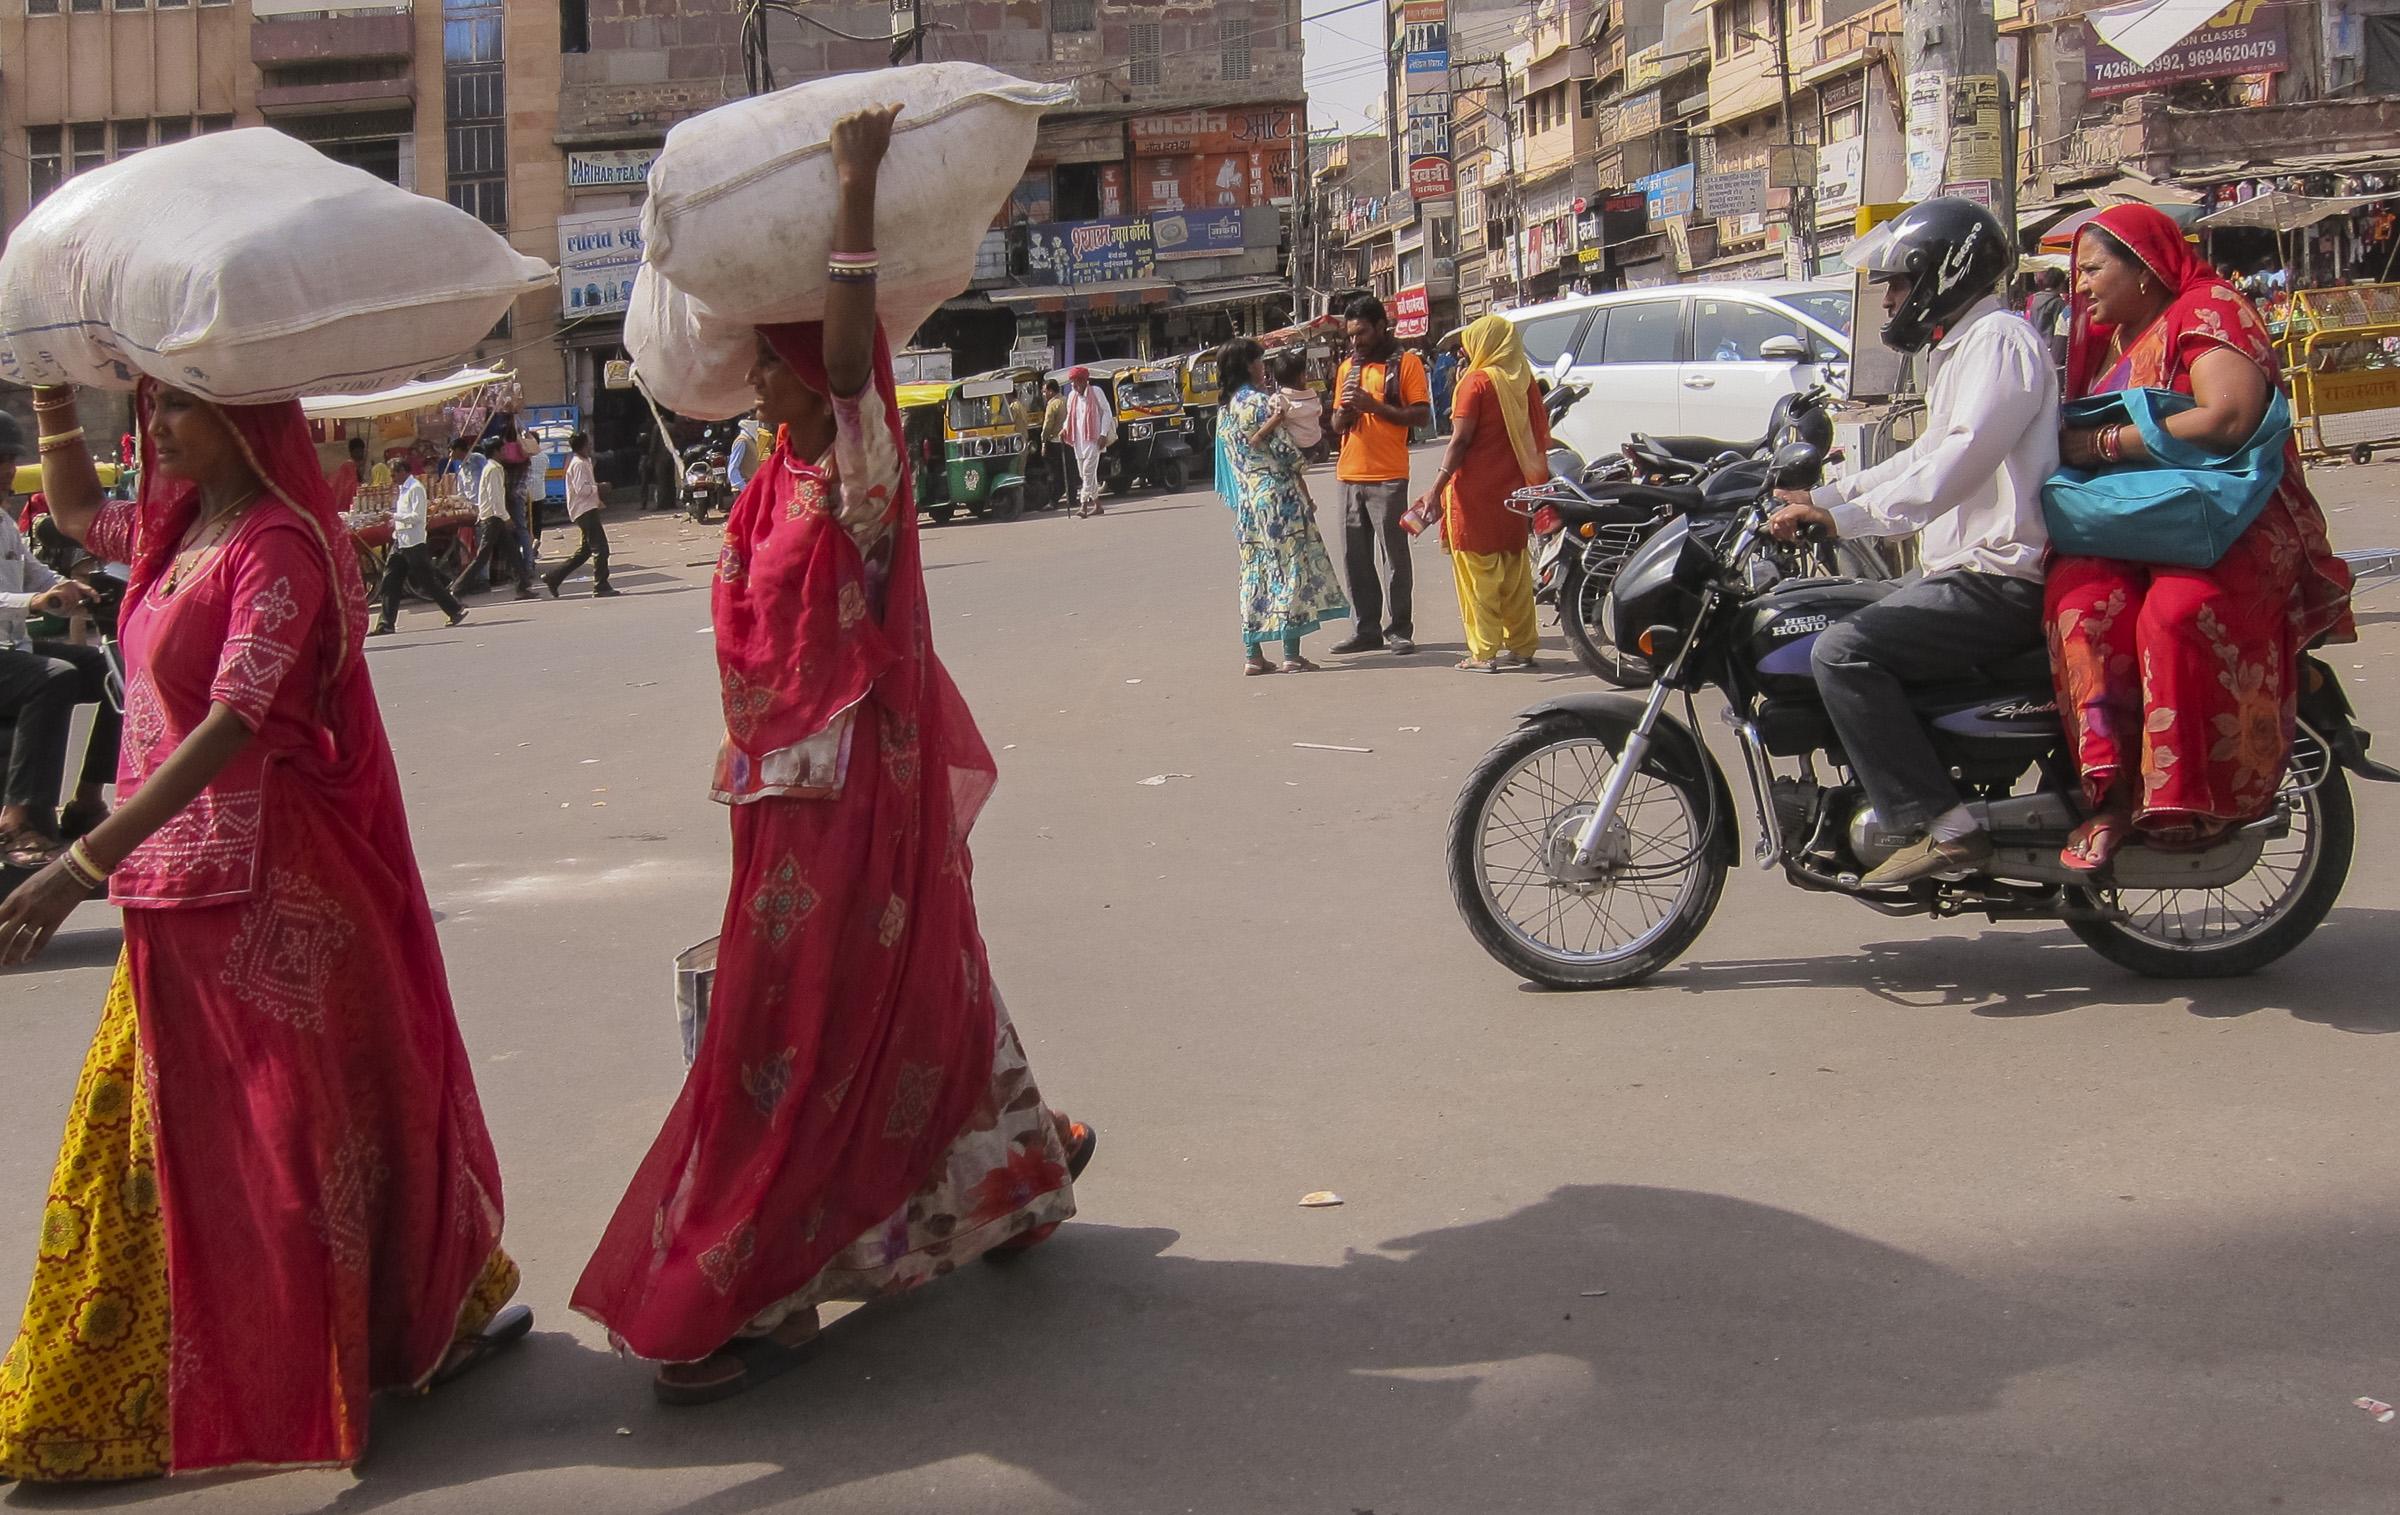 India2018_067_IMG_7093.jpg